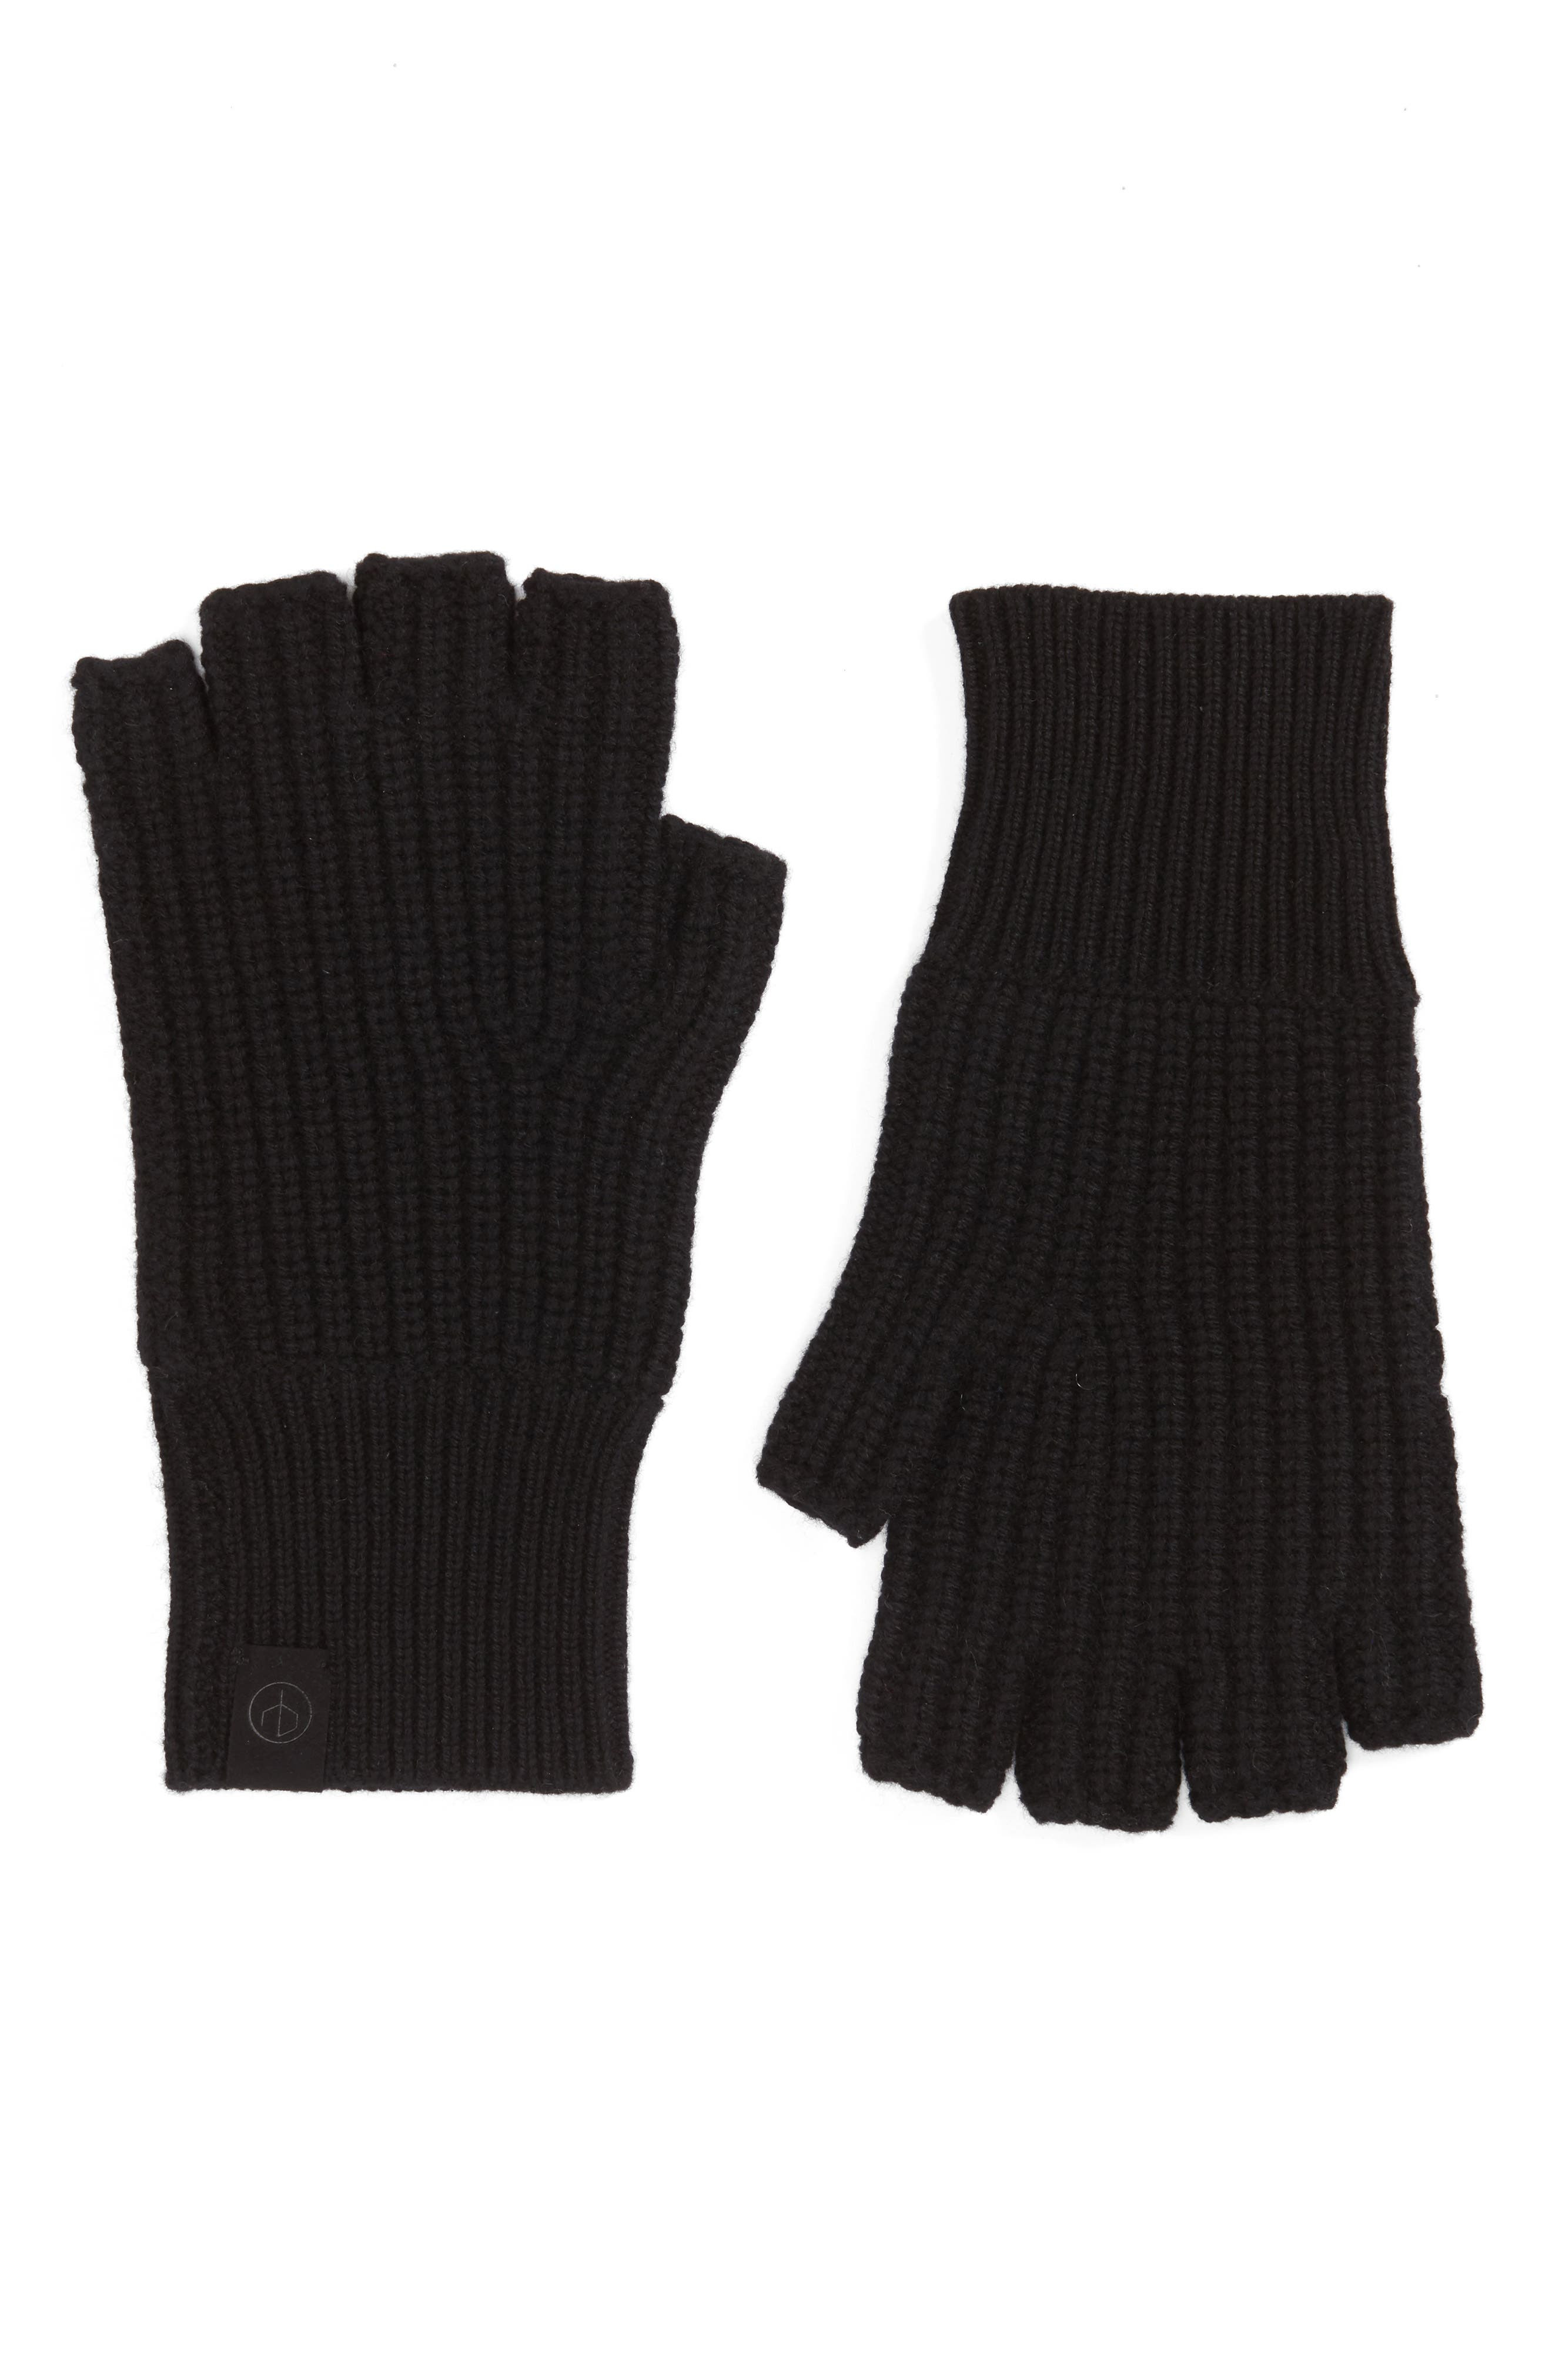 Main Image - rag & bone Ace Cashmere Knit Fingerless Gloves